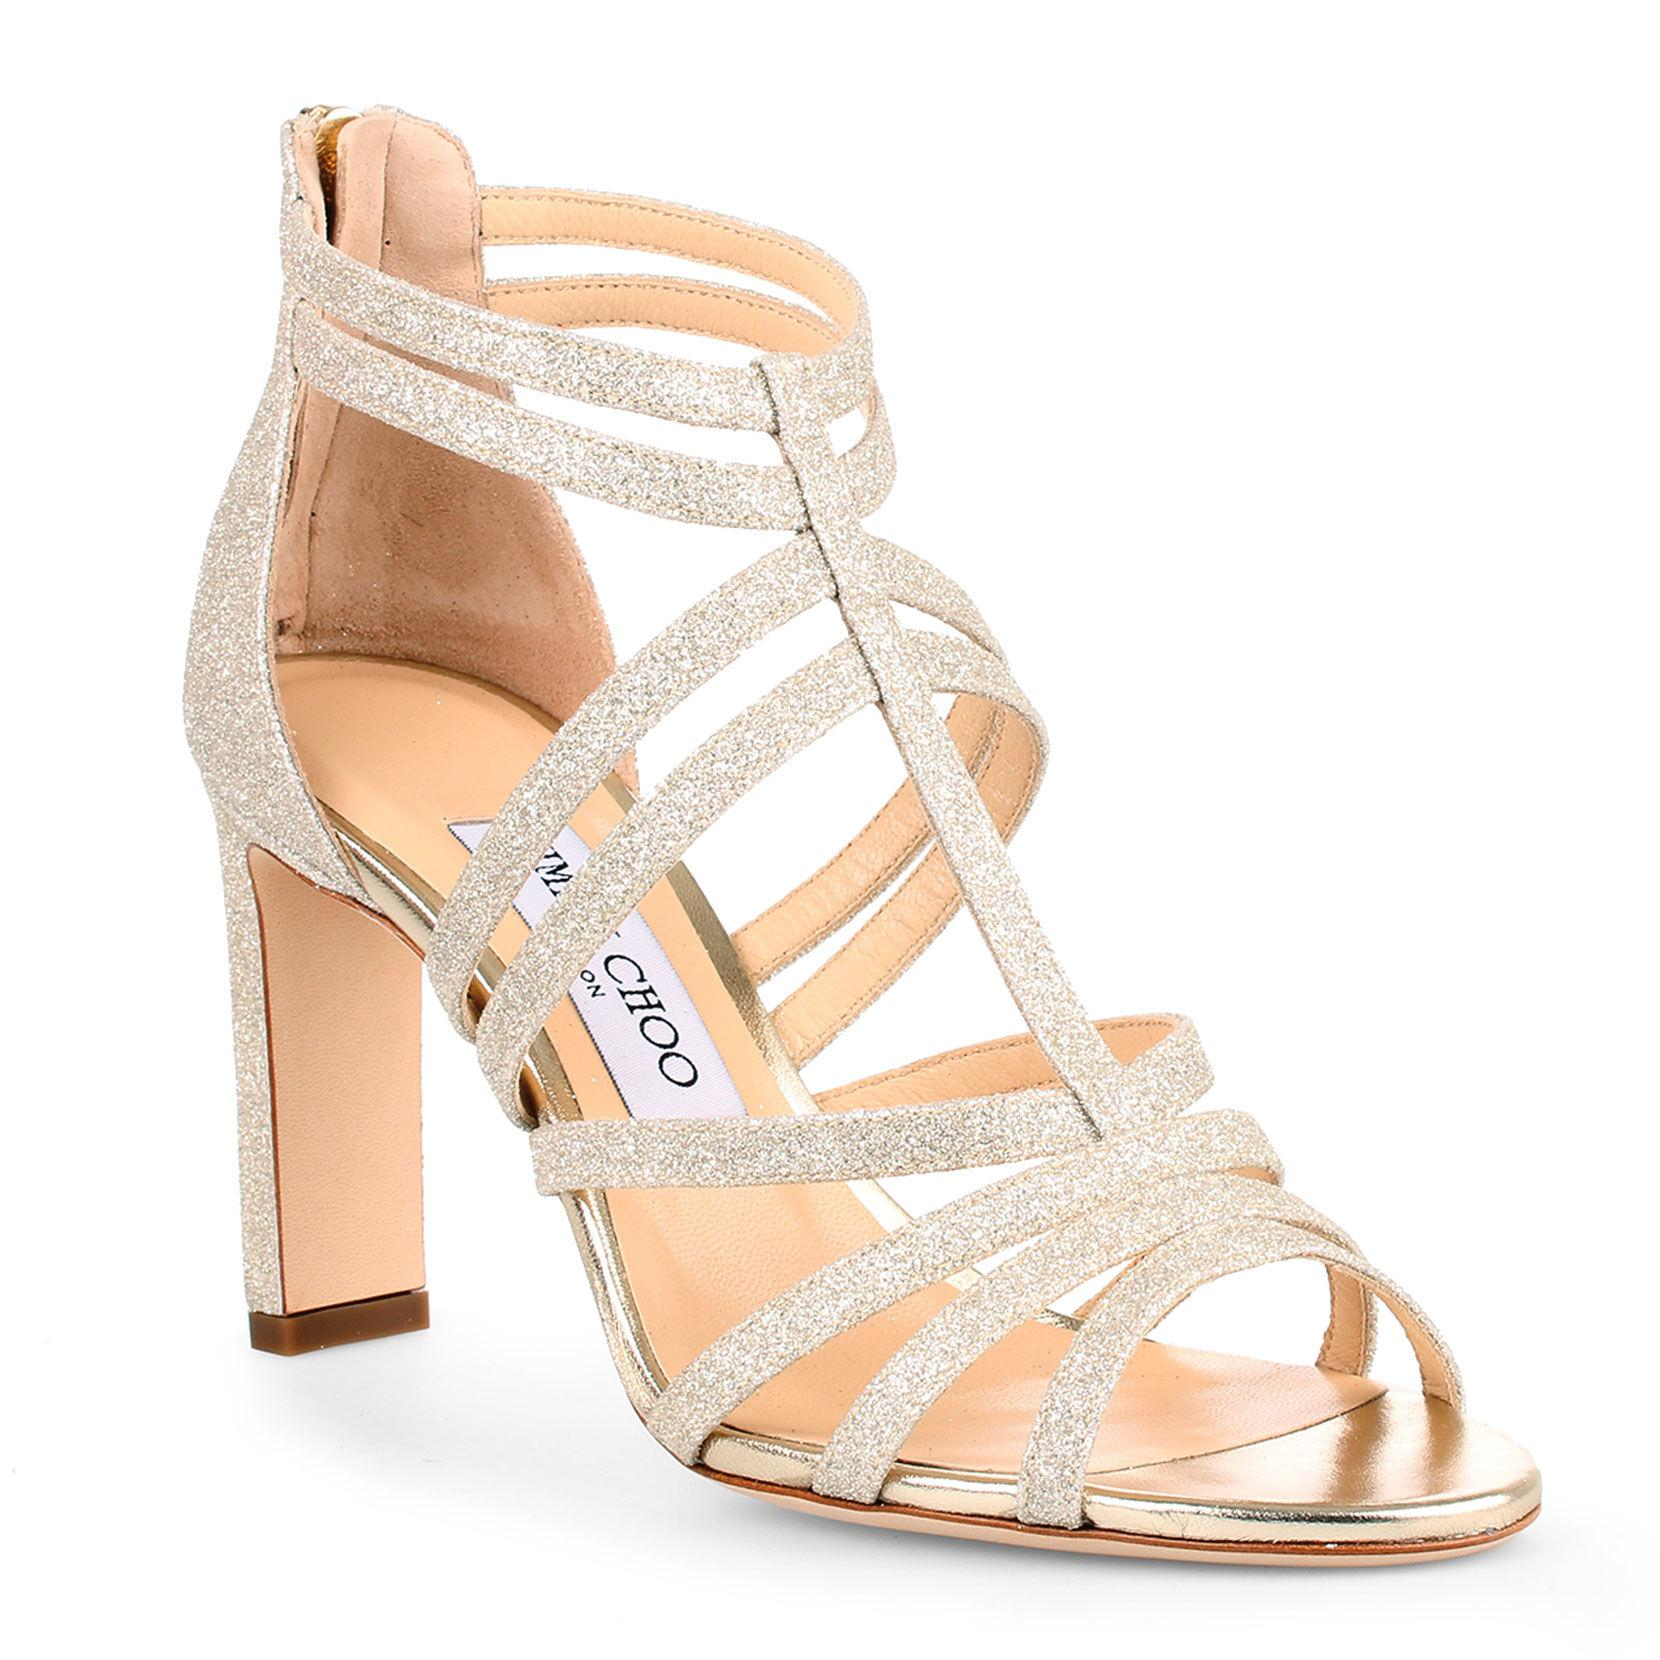 f3645712e582 Lyst - Jimmy Choo Selina 85 Dusty Glitter Sandals in Metallic